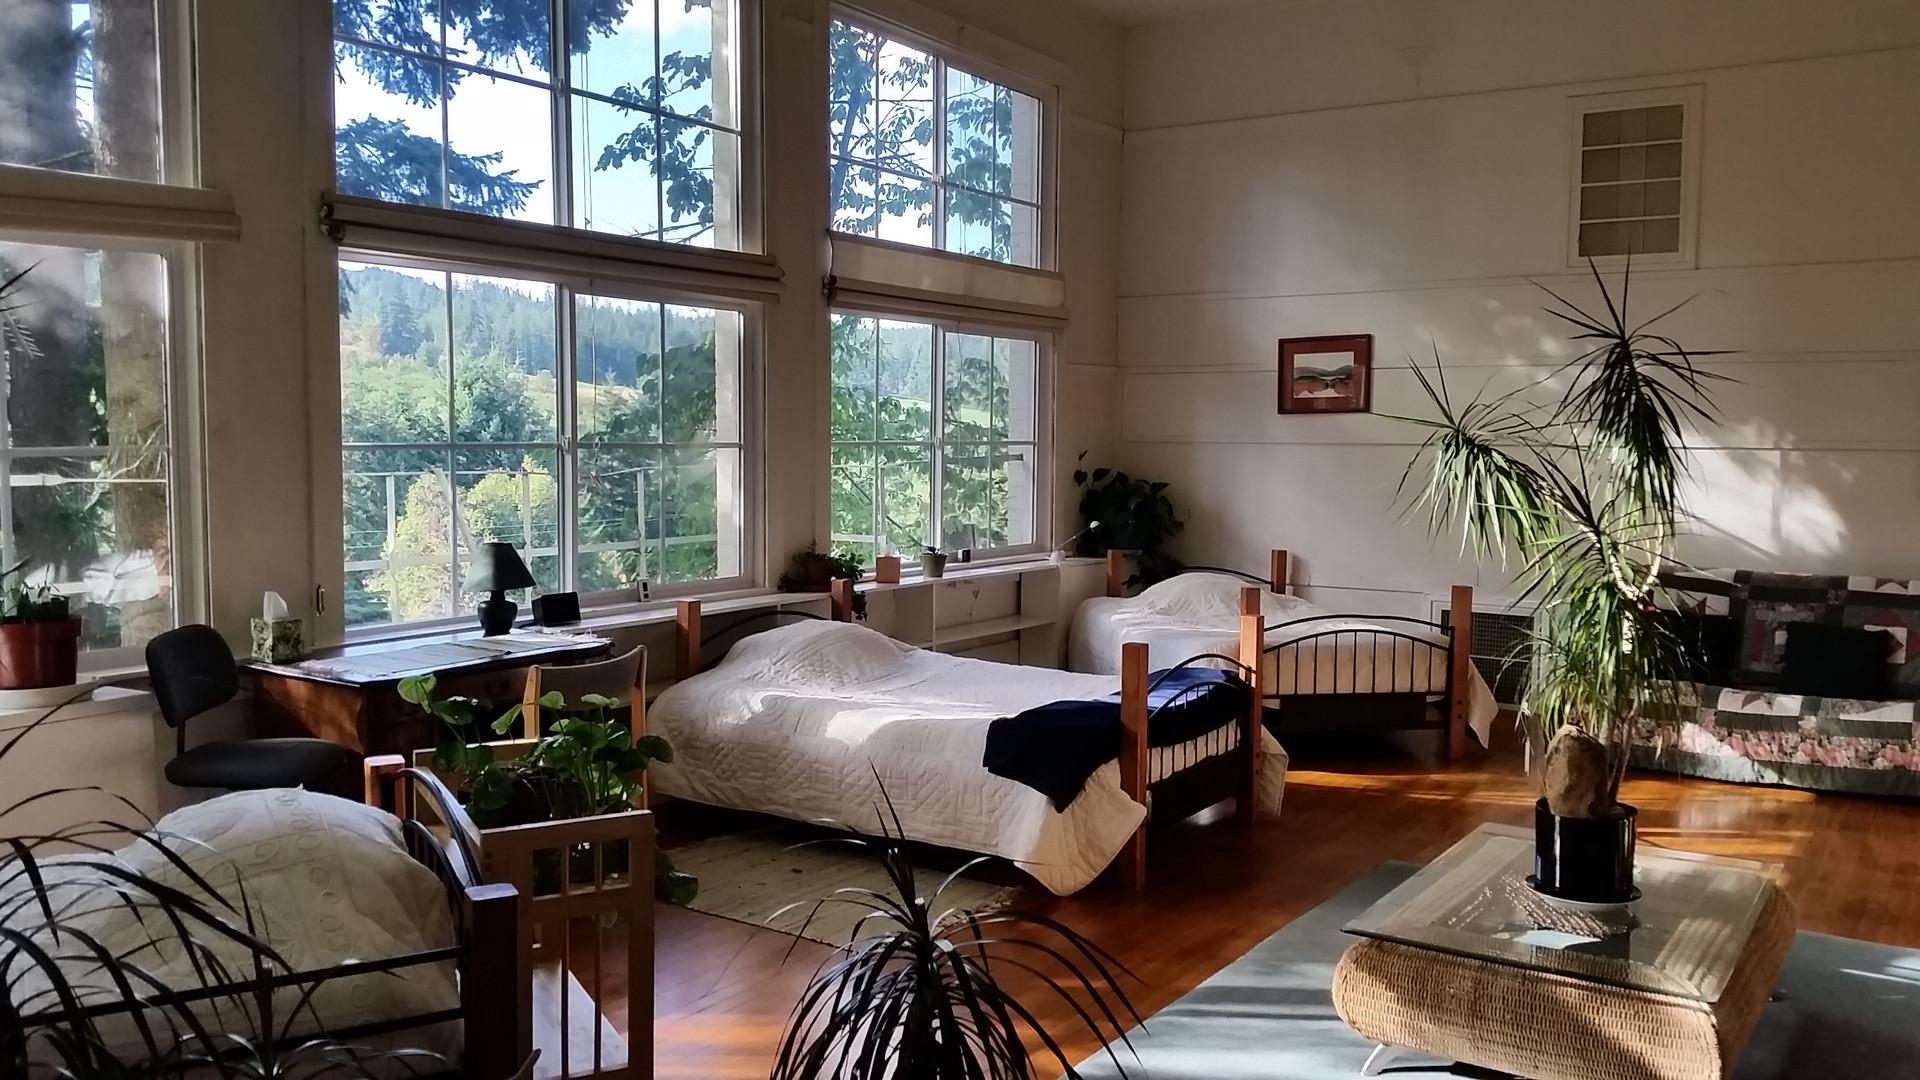 West Dorm